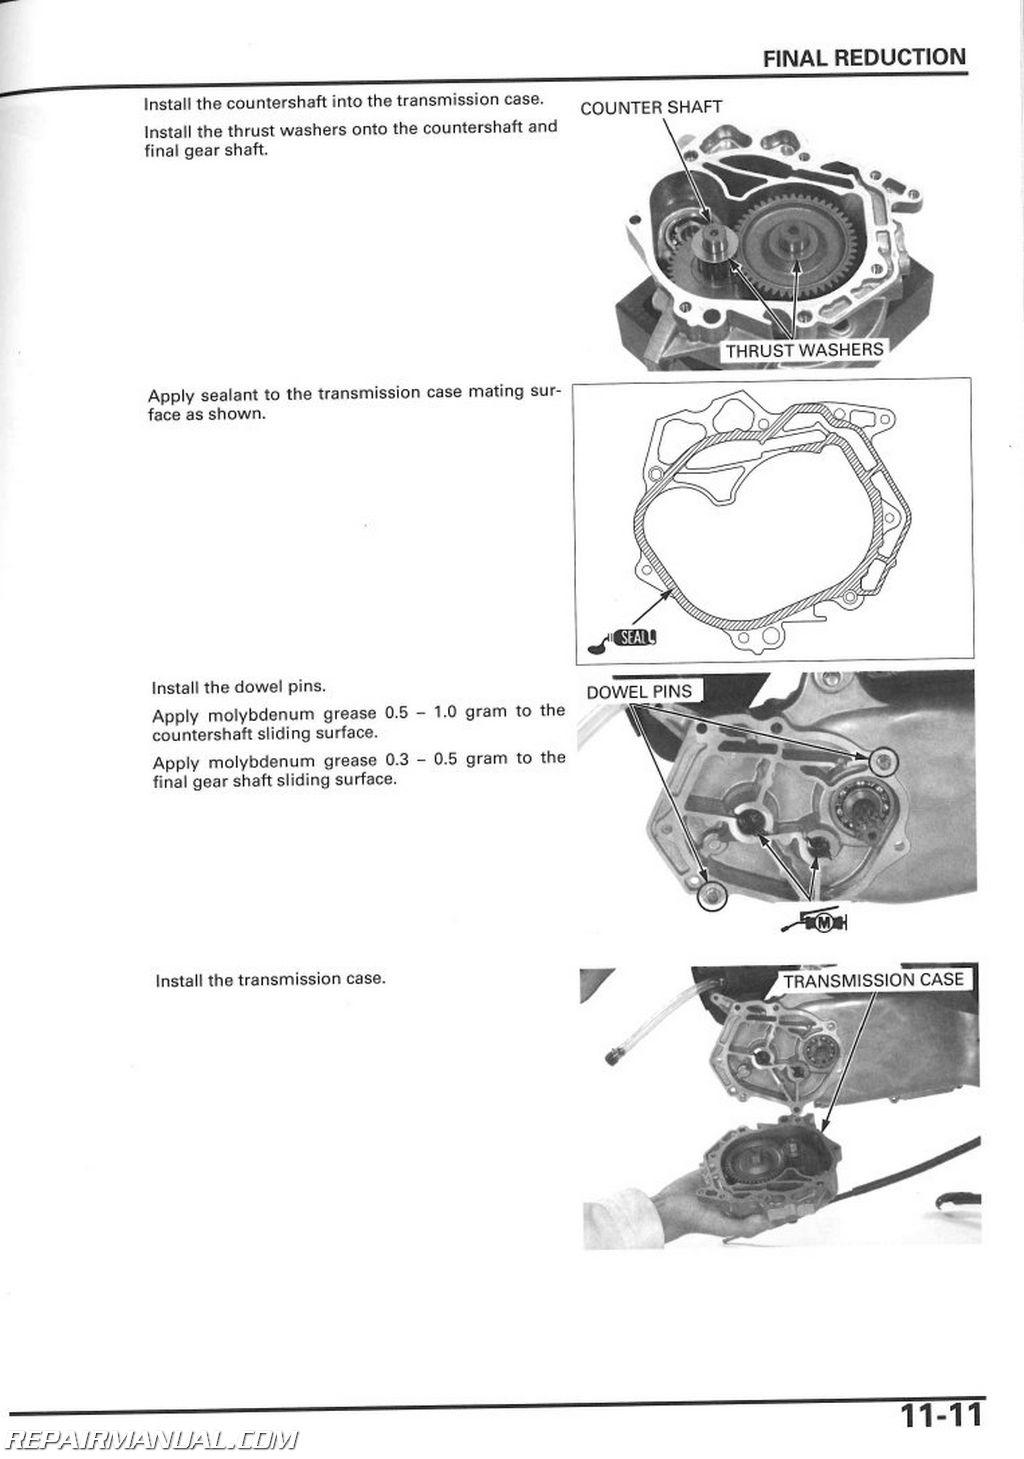 honda zoomer x wiring diagram danfoss 3 way valve 2003 2016 nps50 ruckus scooter service manual